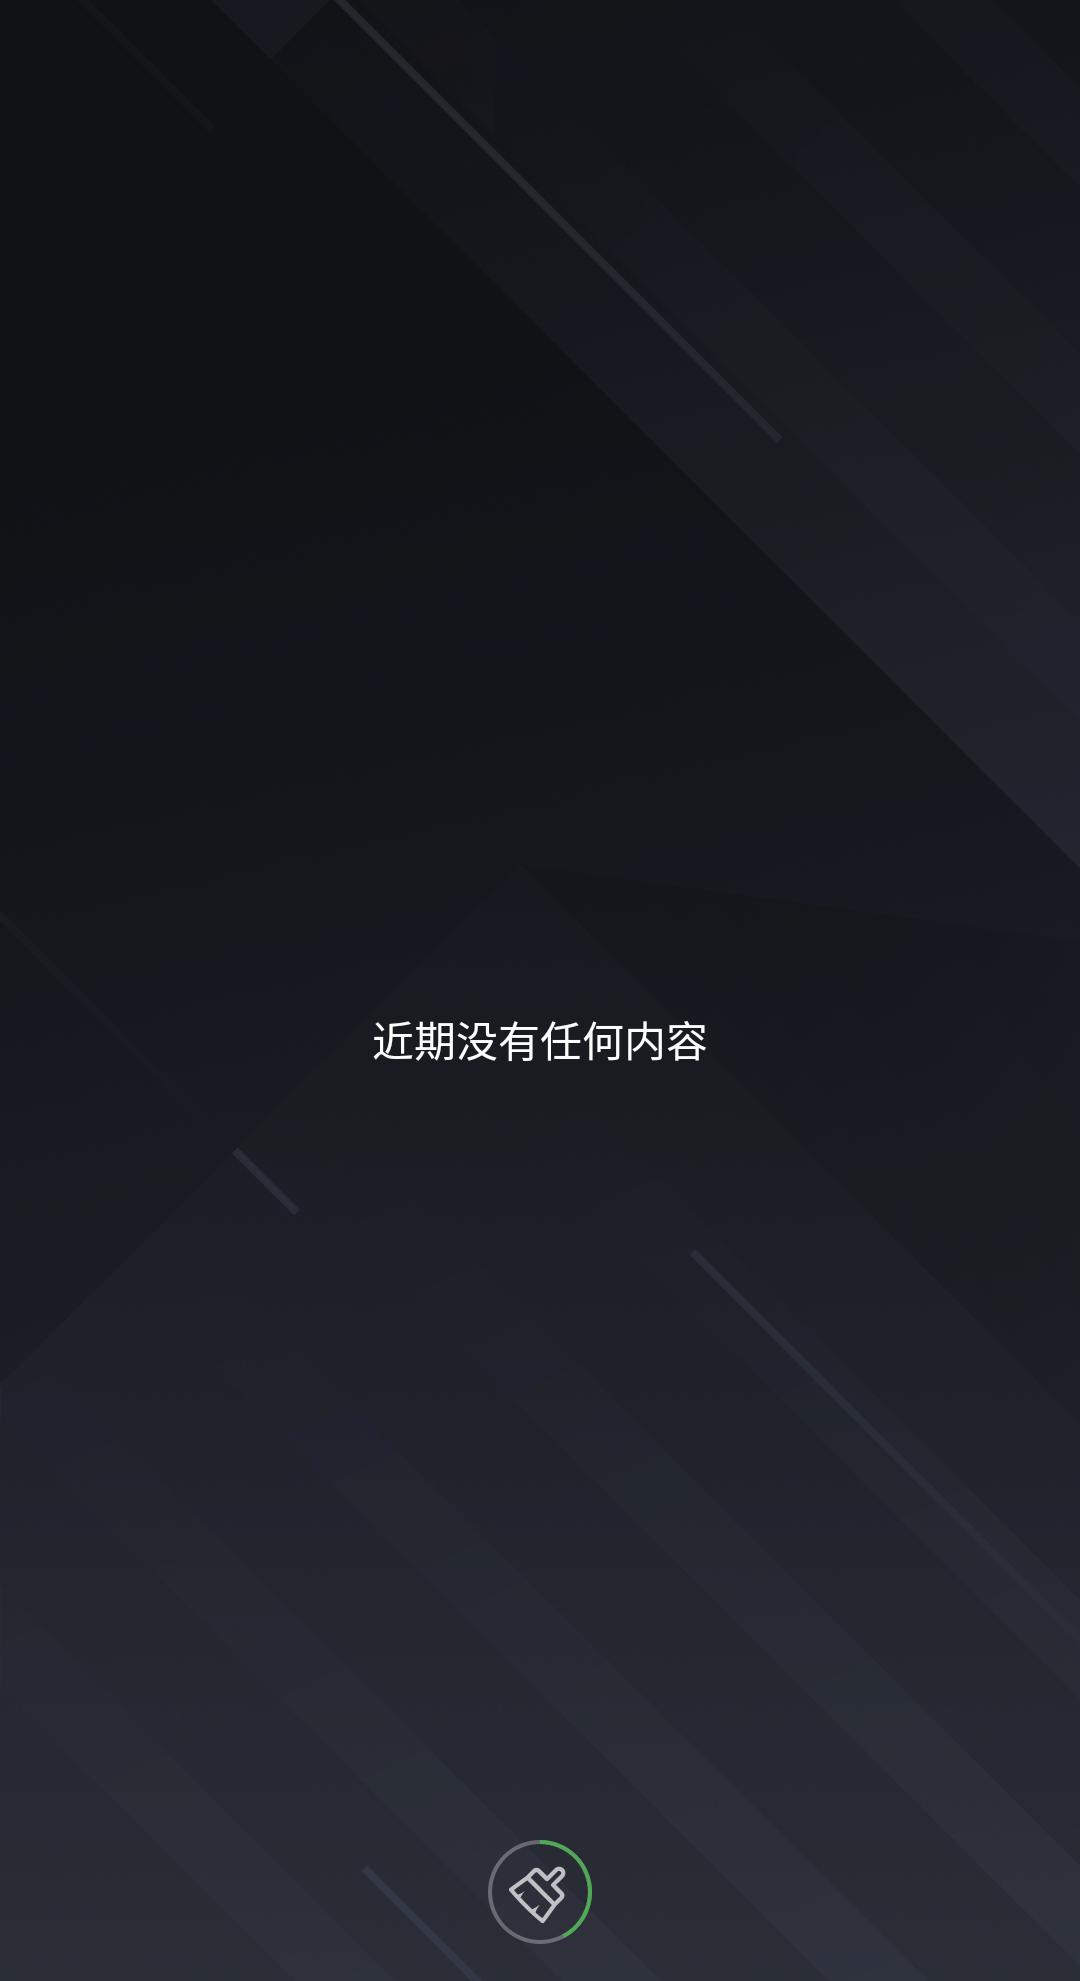 Screenshot_2019-09-06-20-09-34.png